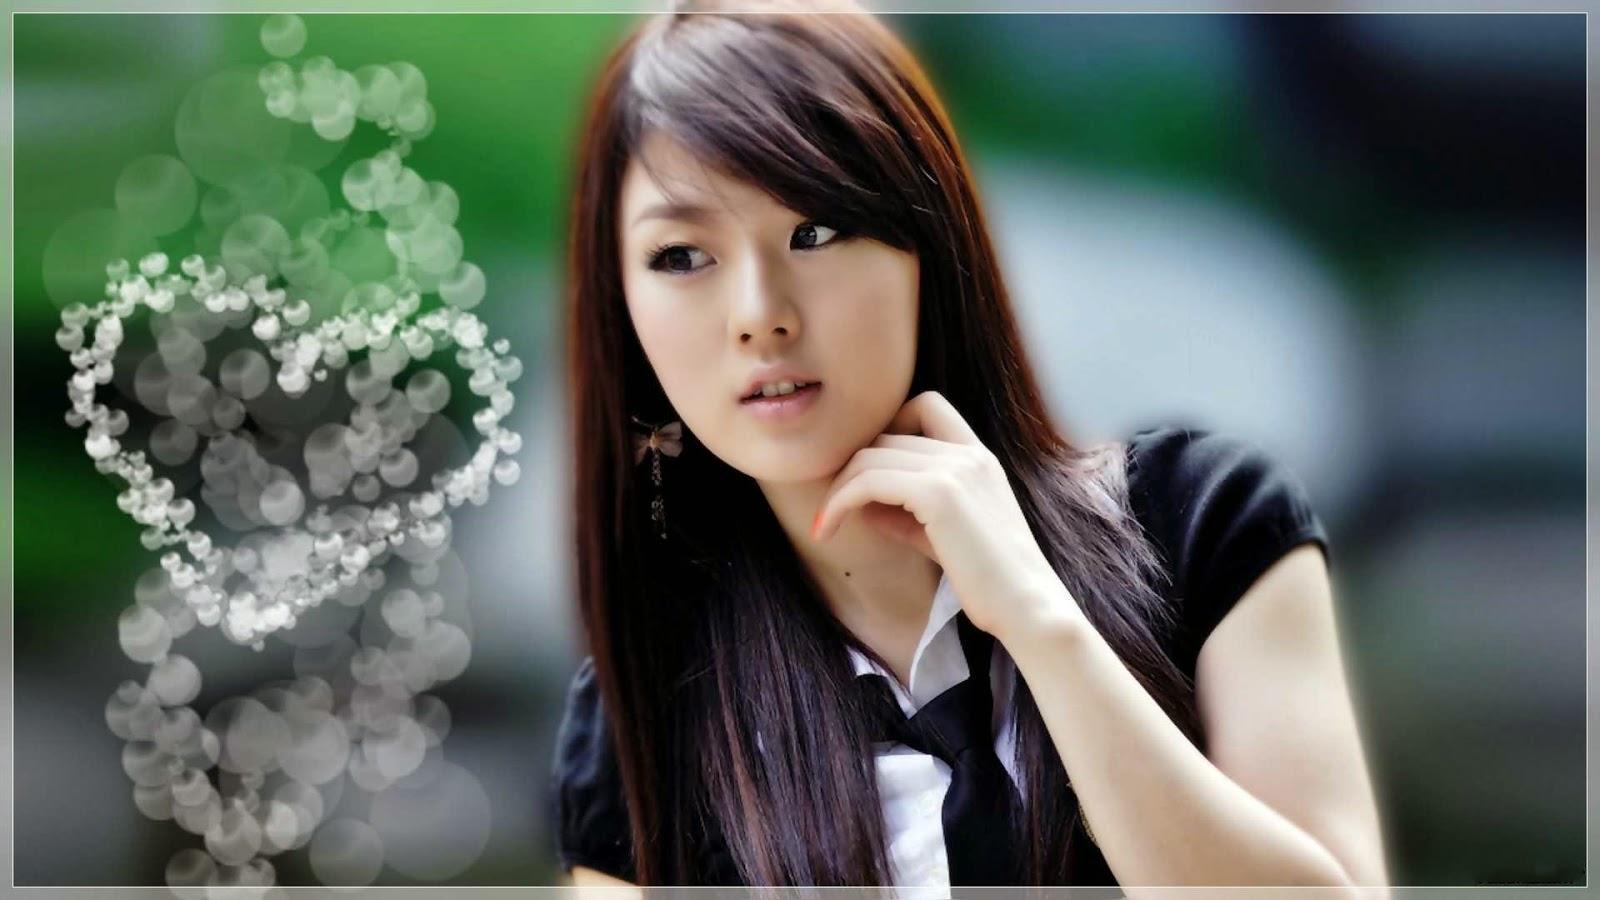 37ab5e244 خلفيات بنات كوريات , اجمل البنات الكورية - دلع ورد